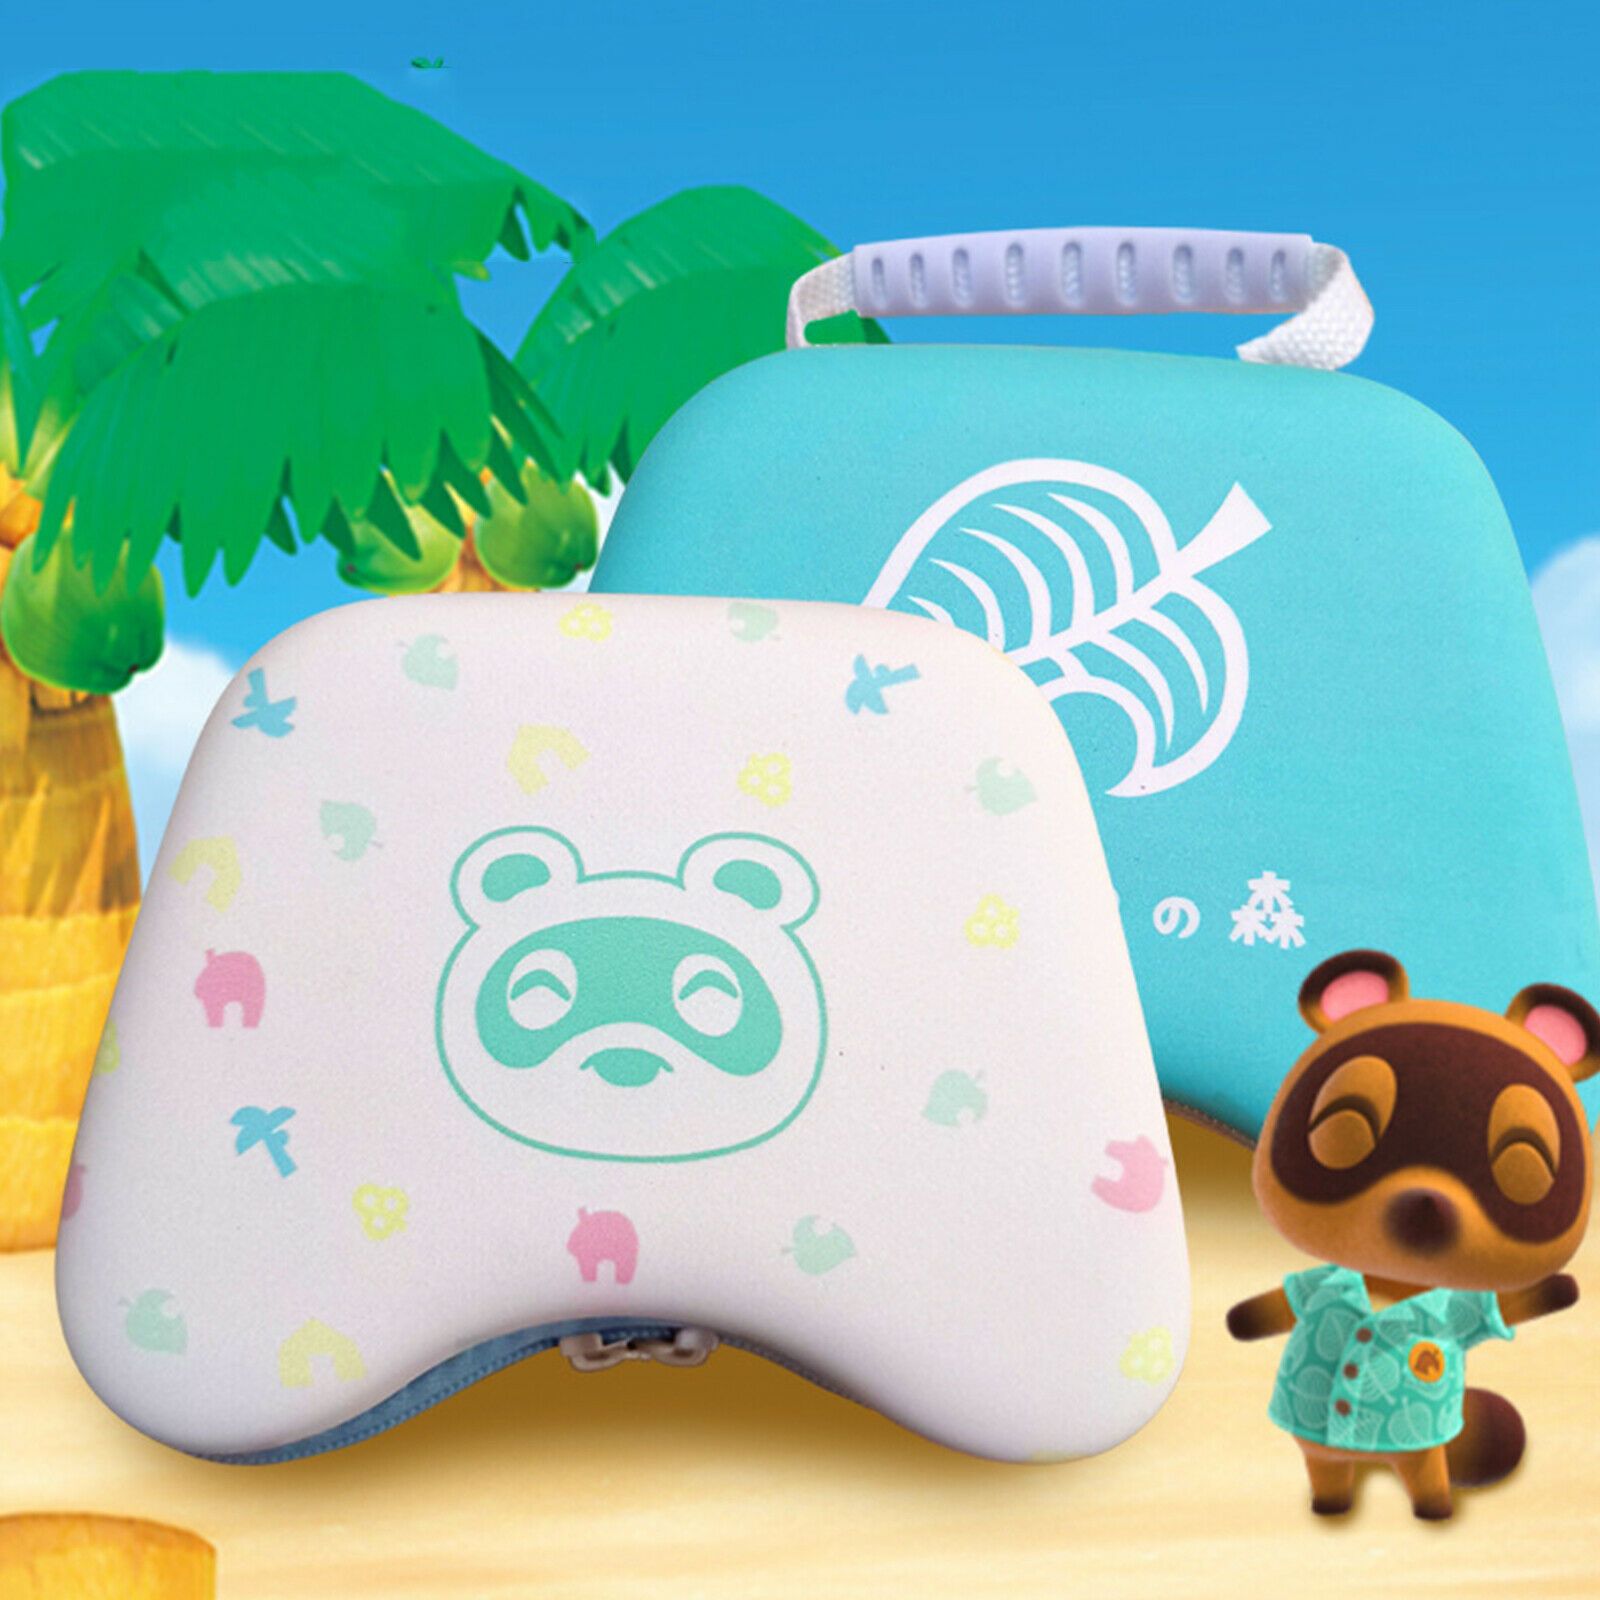 Bao đựng cho tay cầm PS4 Xbox One Pro Controller Switch mẫu Animal Crossing